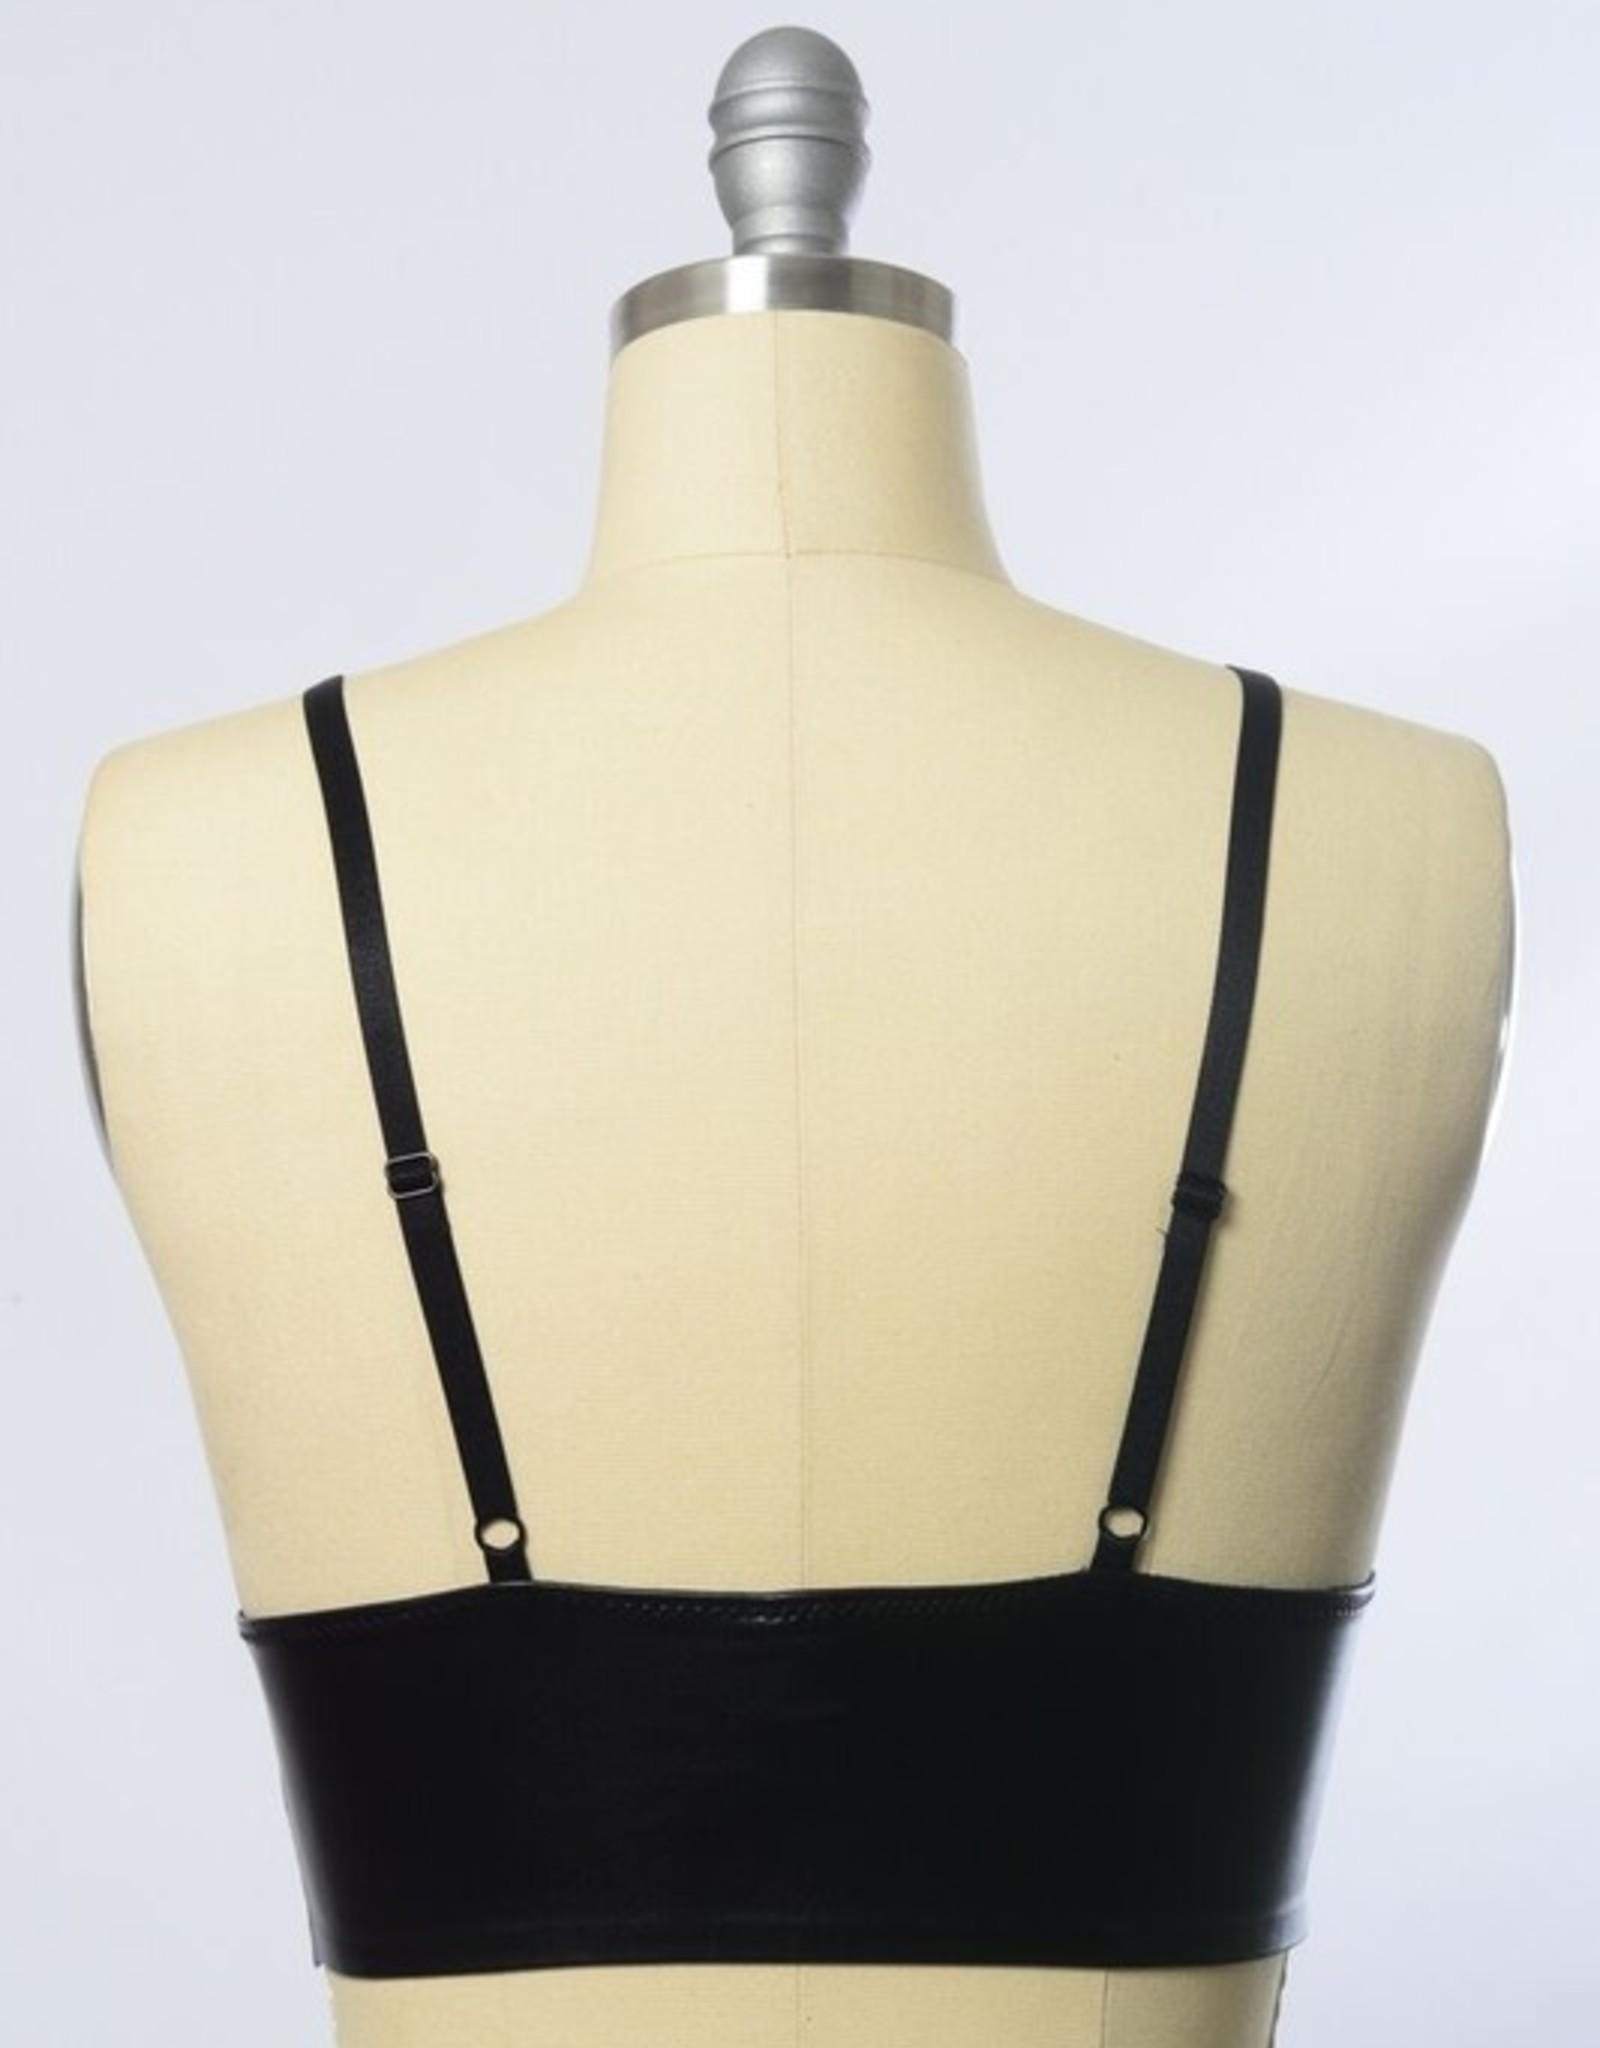 Leto Accessories Vegan Leather Plunge Bralette